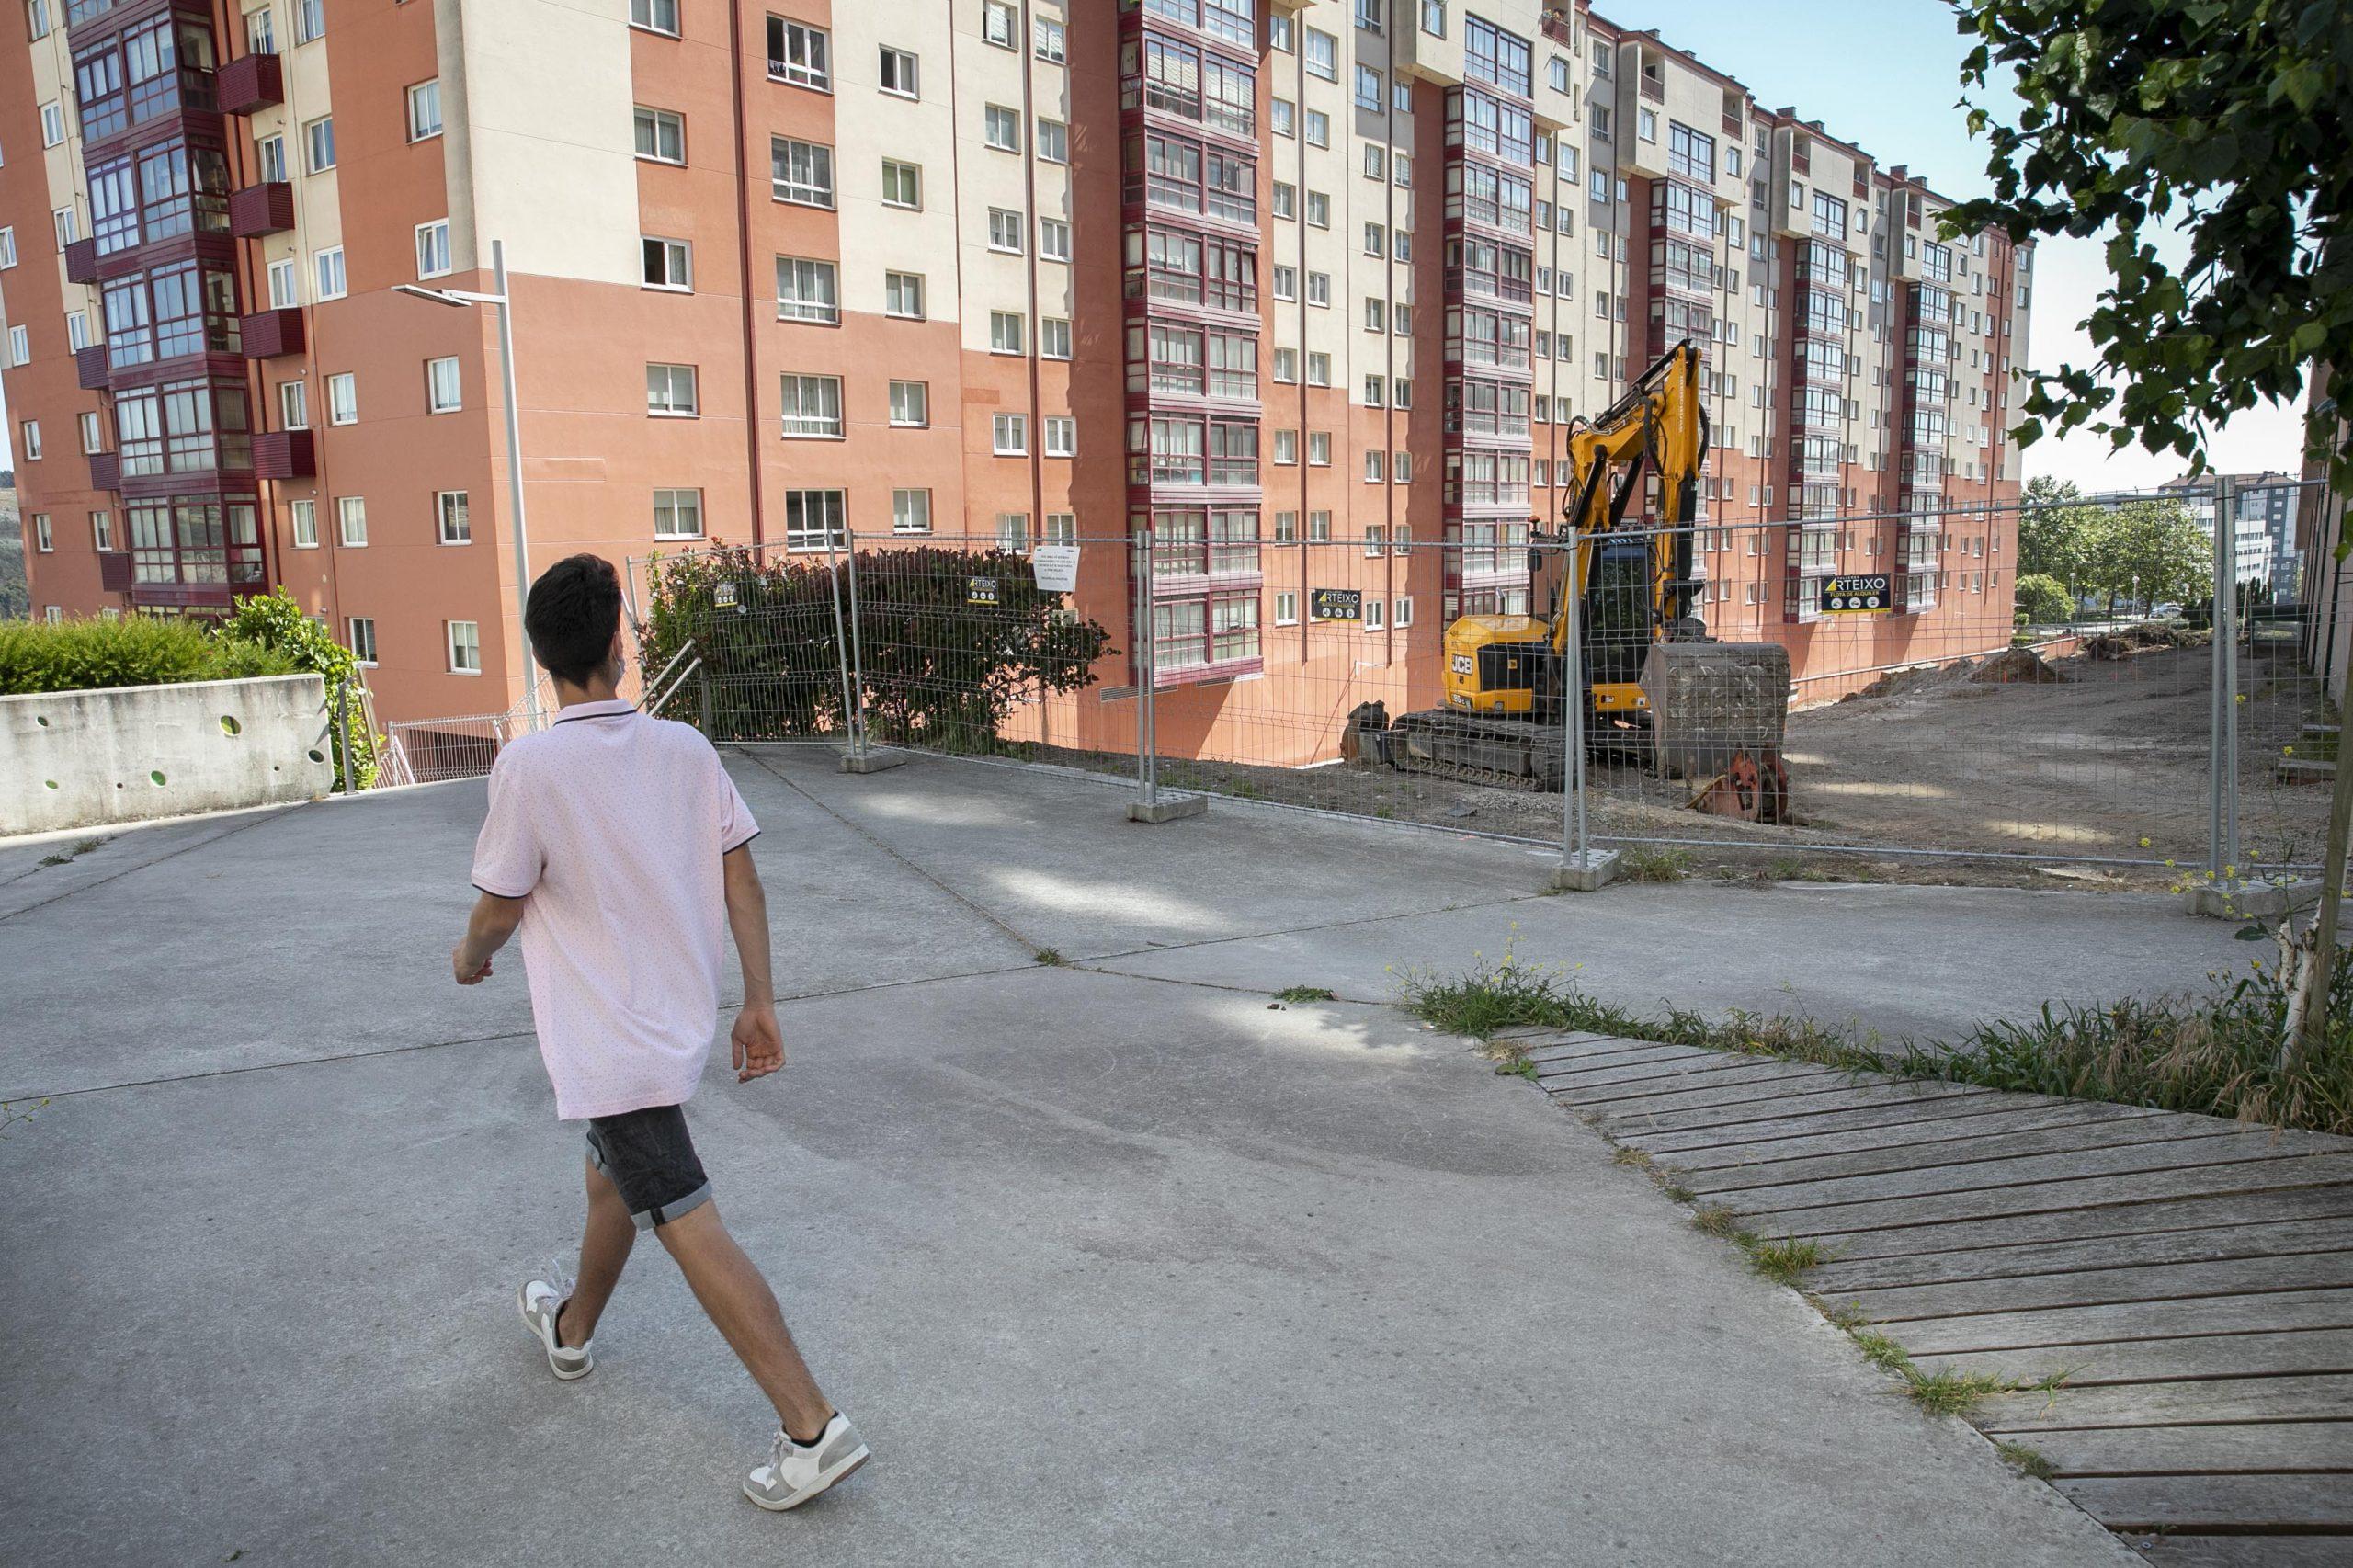 Obras del corredor verde de Novo Mesoiro en A Coruña